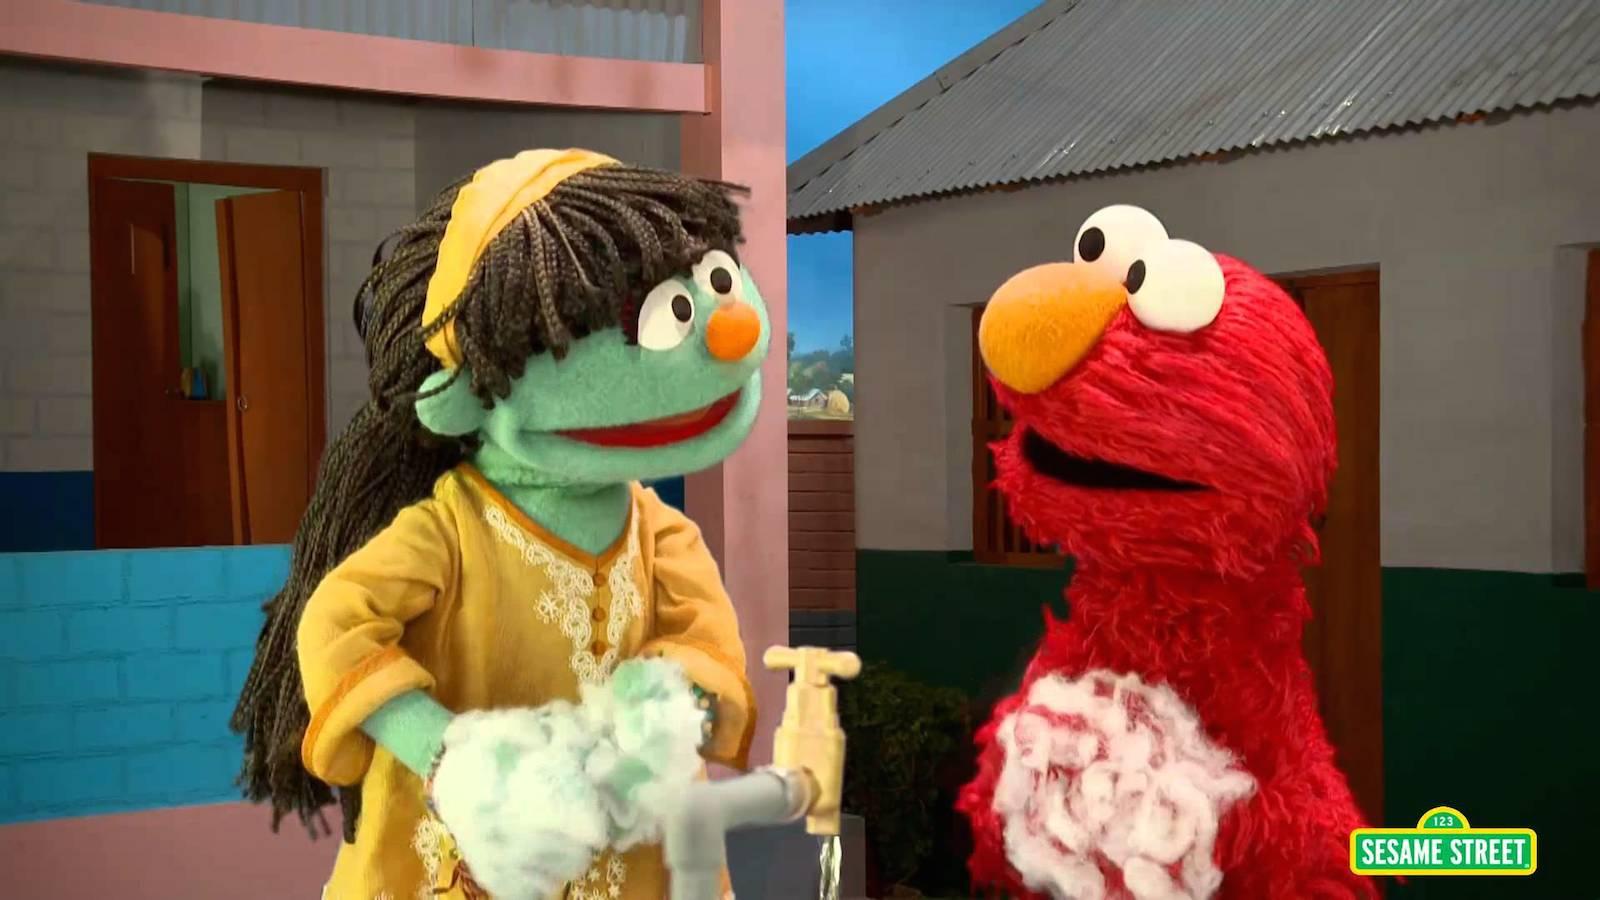 ©2015 Sesame Street Workshop